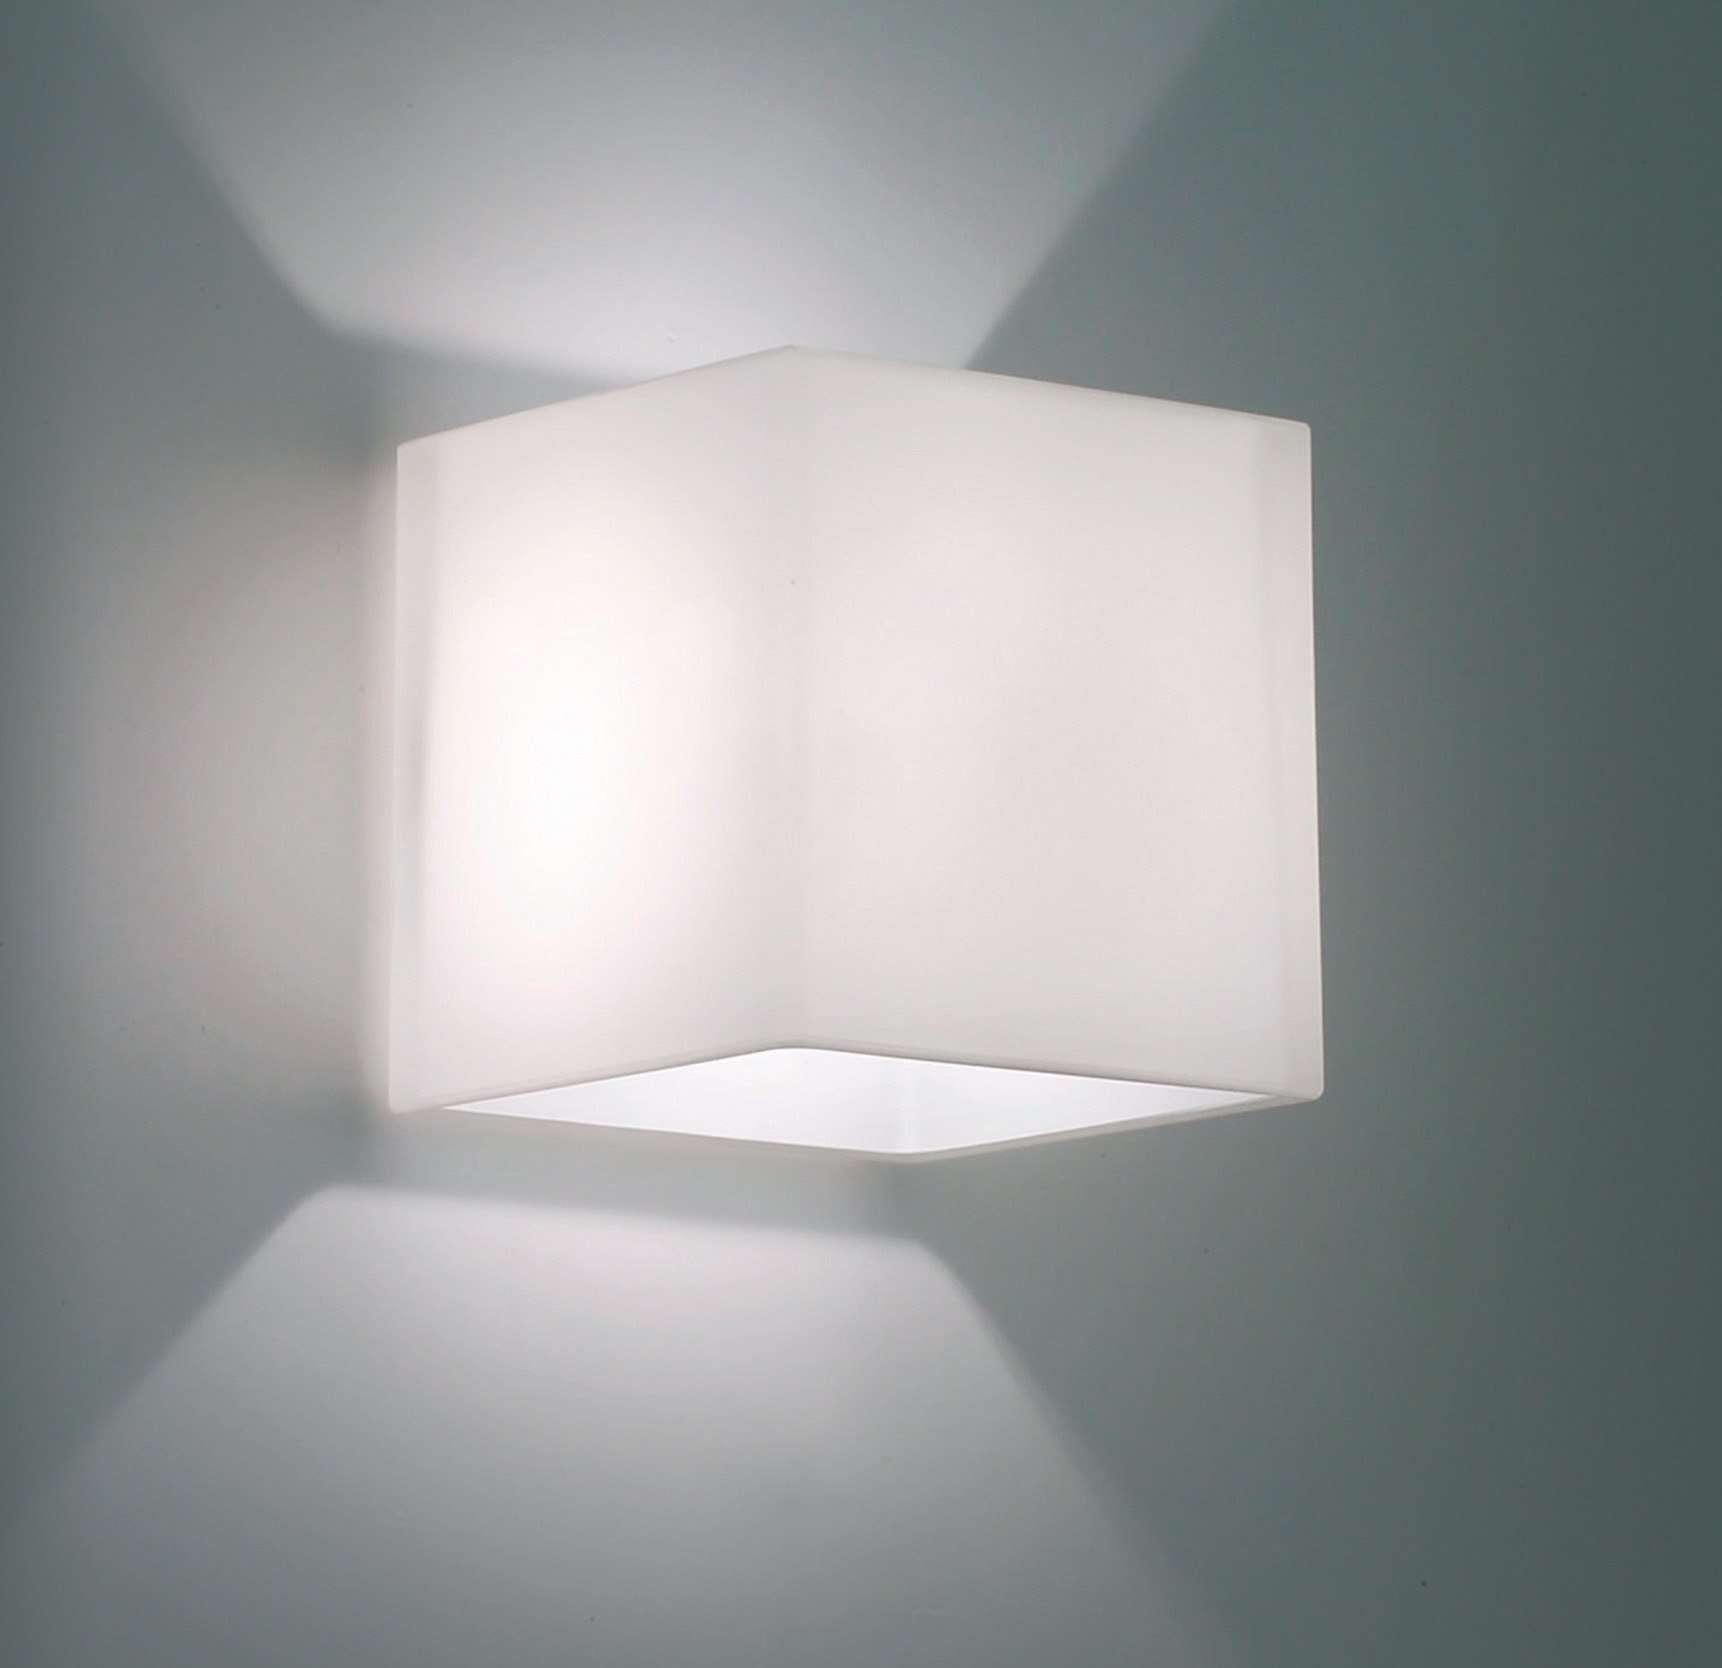 Wandlampe Indirekte Beleuchtung Style